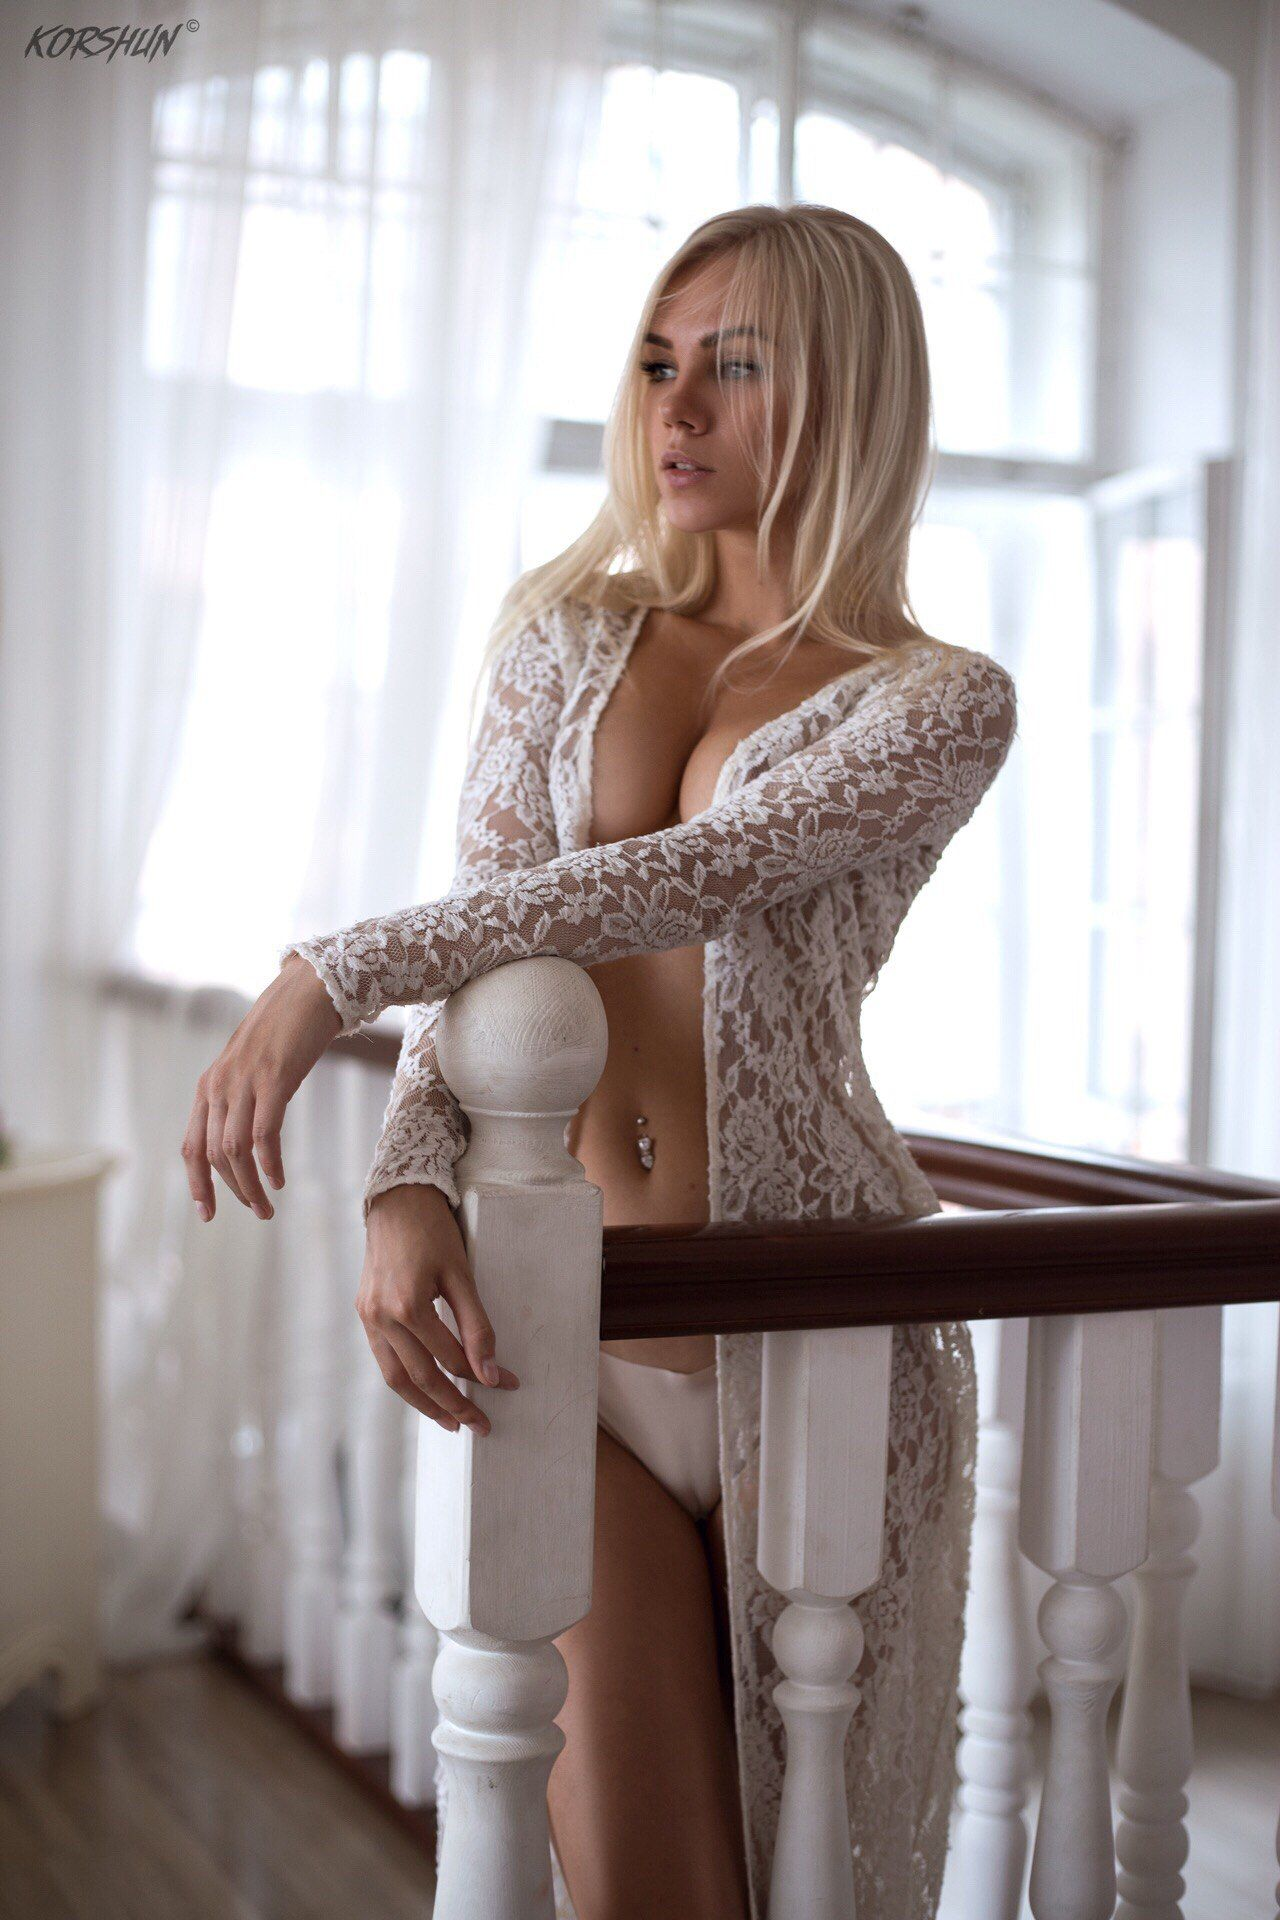 russian beauty girls porn in dubai